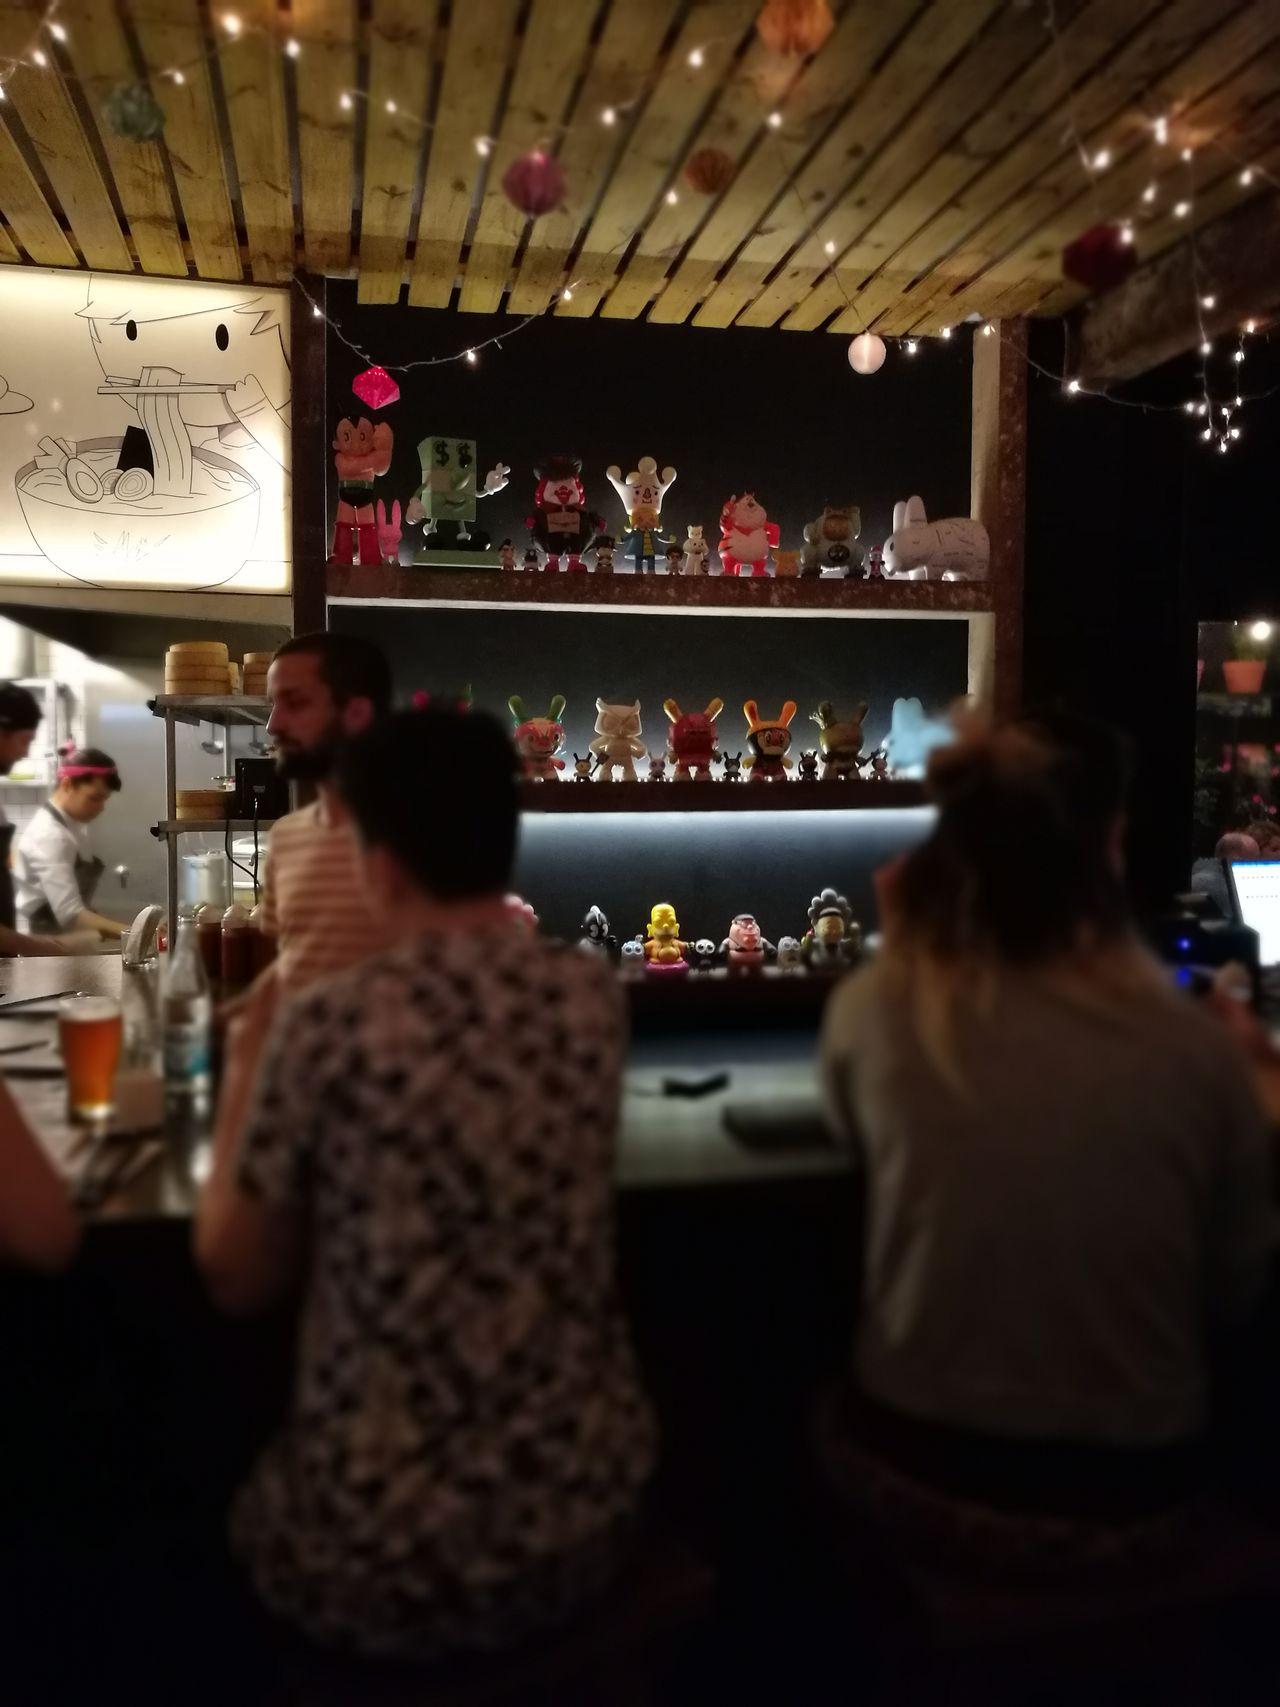 Bar Counter Indoors  Illuminated Bar - Drink Establishment People Ramen Restaurant Ramennoodles Asianfood Ramentime🍜 City Night Bar Peter Griffin Dolls